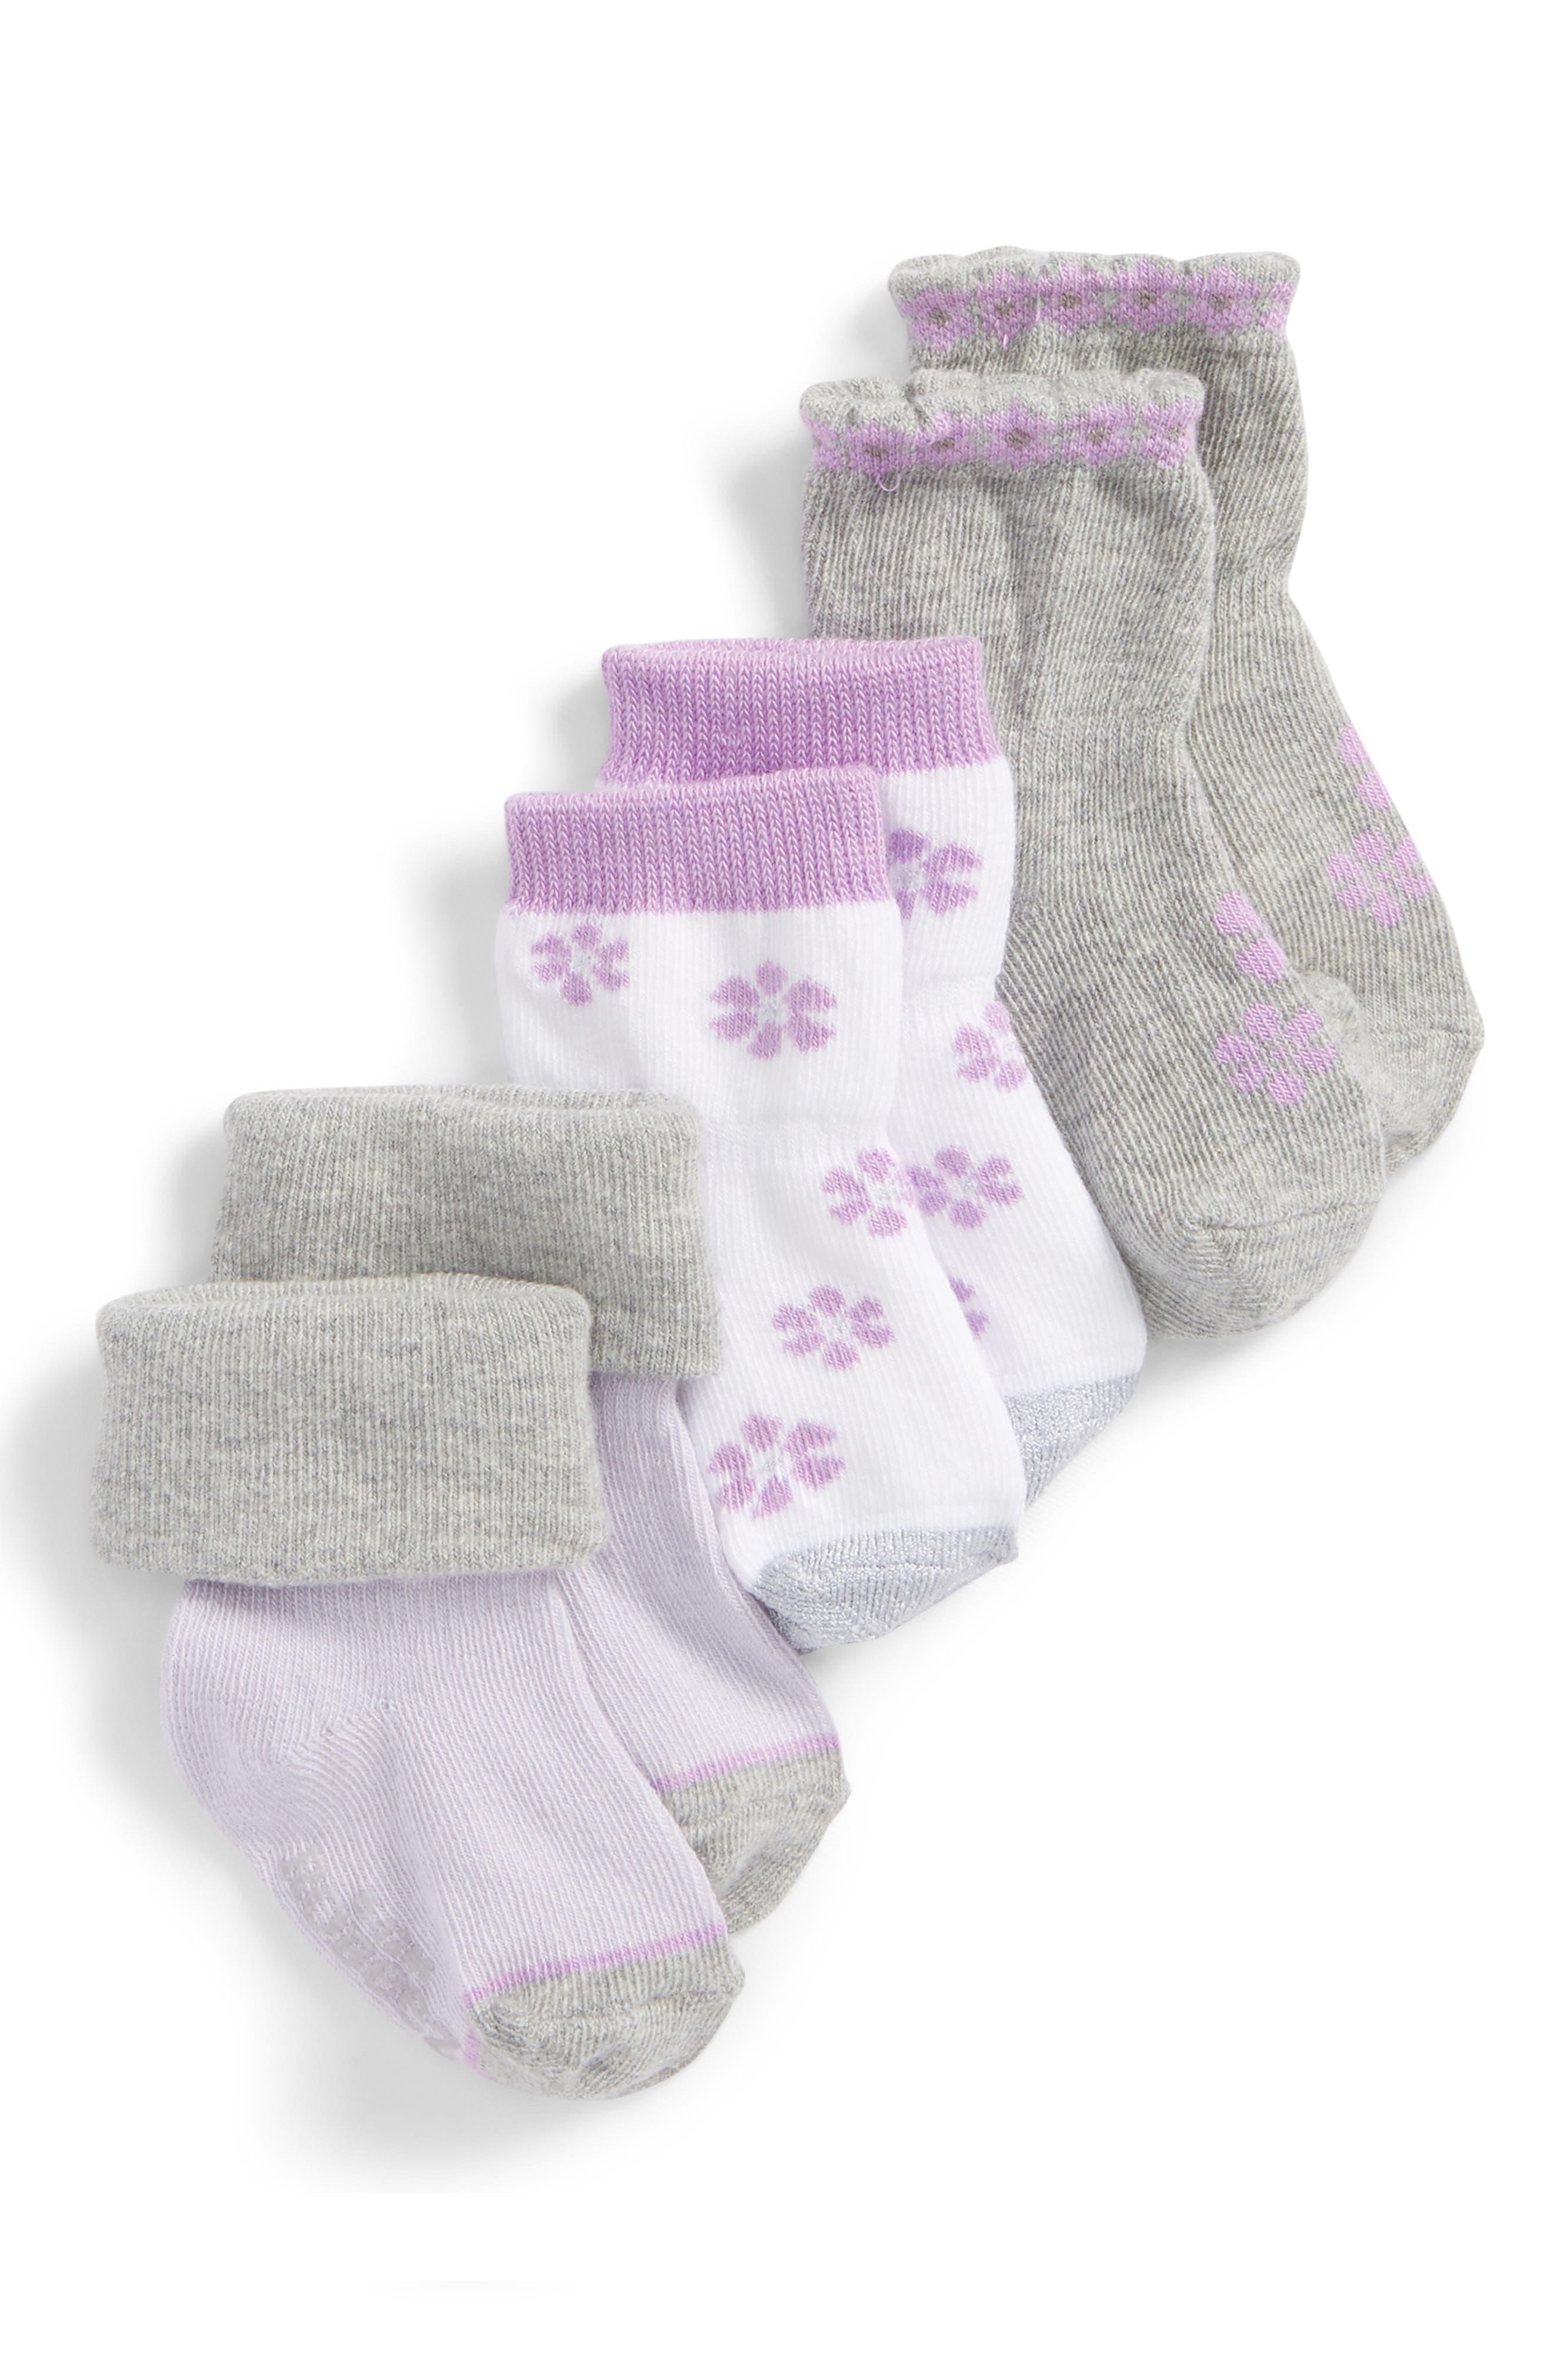 Toddler Girls Robeez Purple Flowers 3Pack Socks Size 1224months  Purple